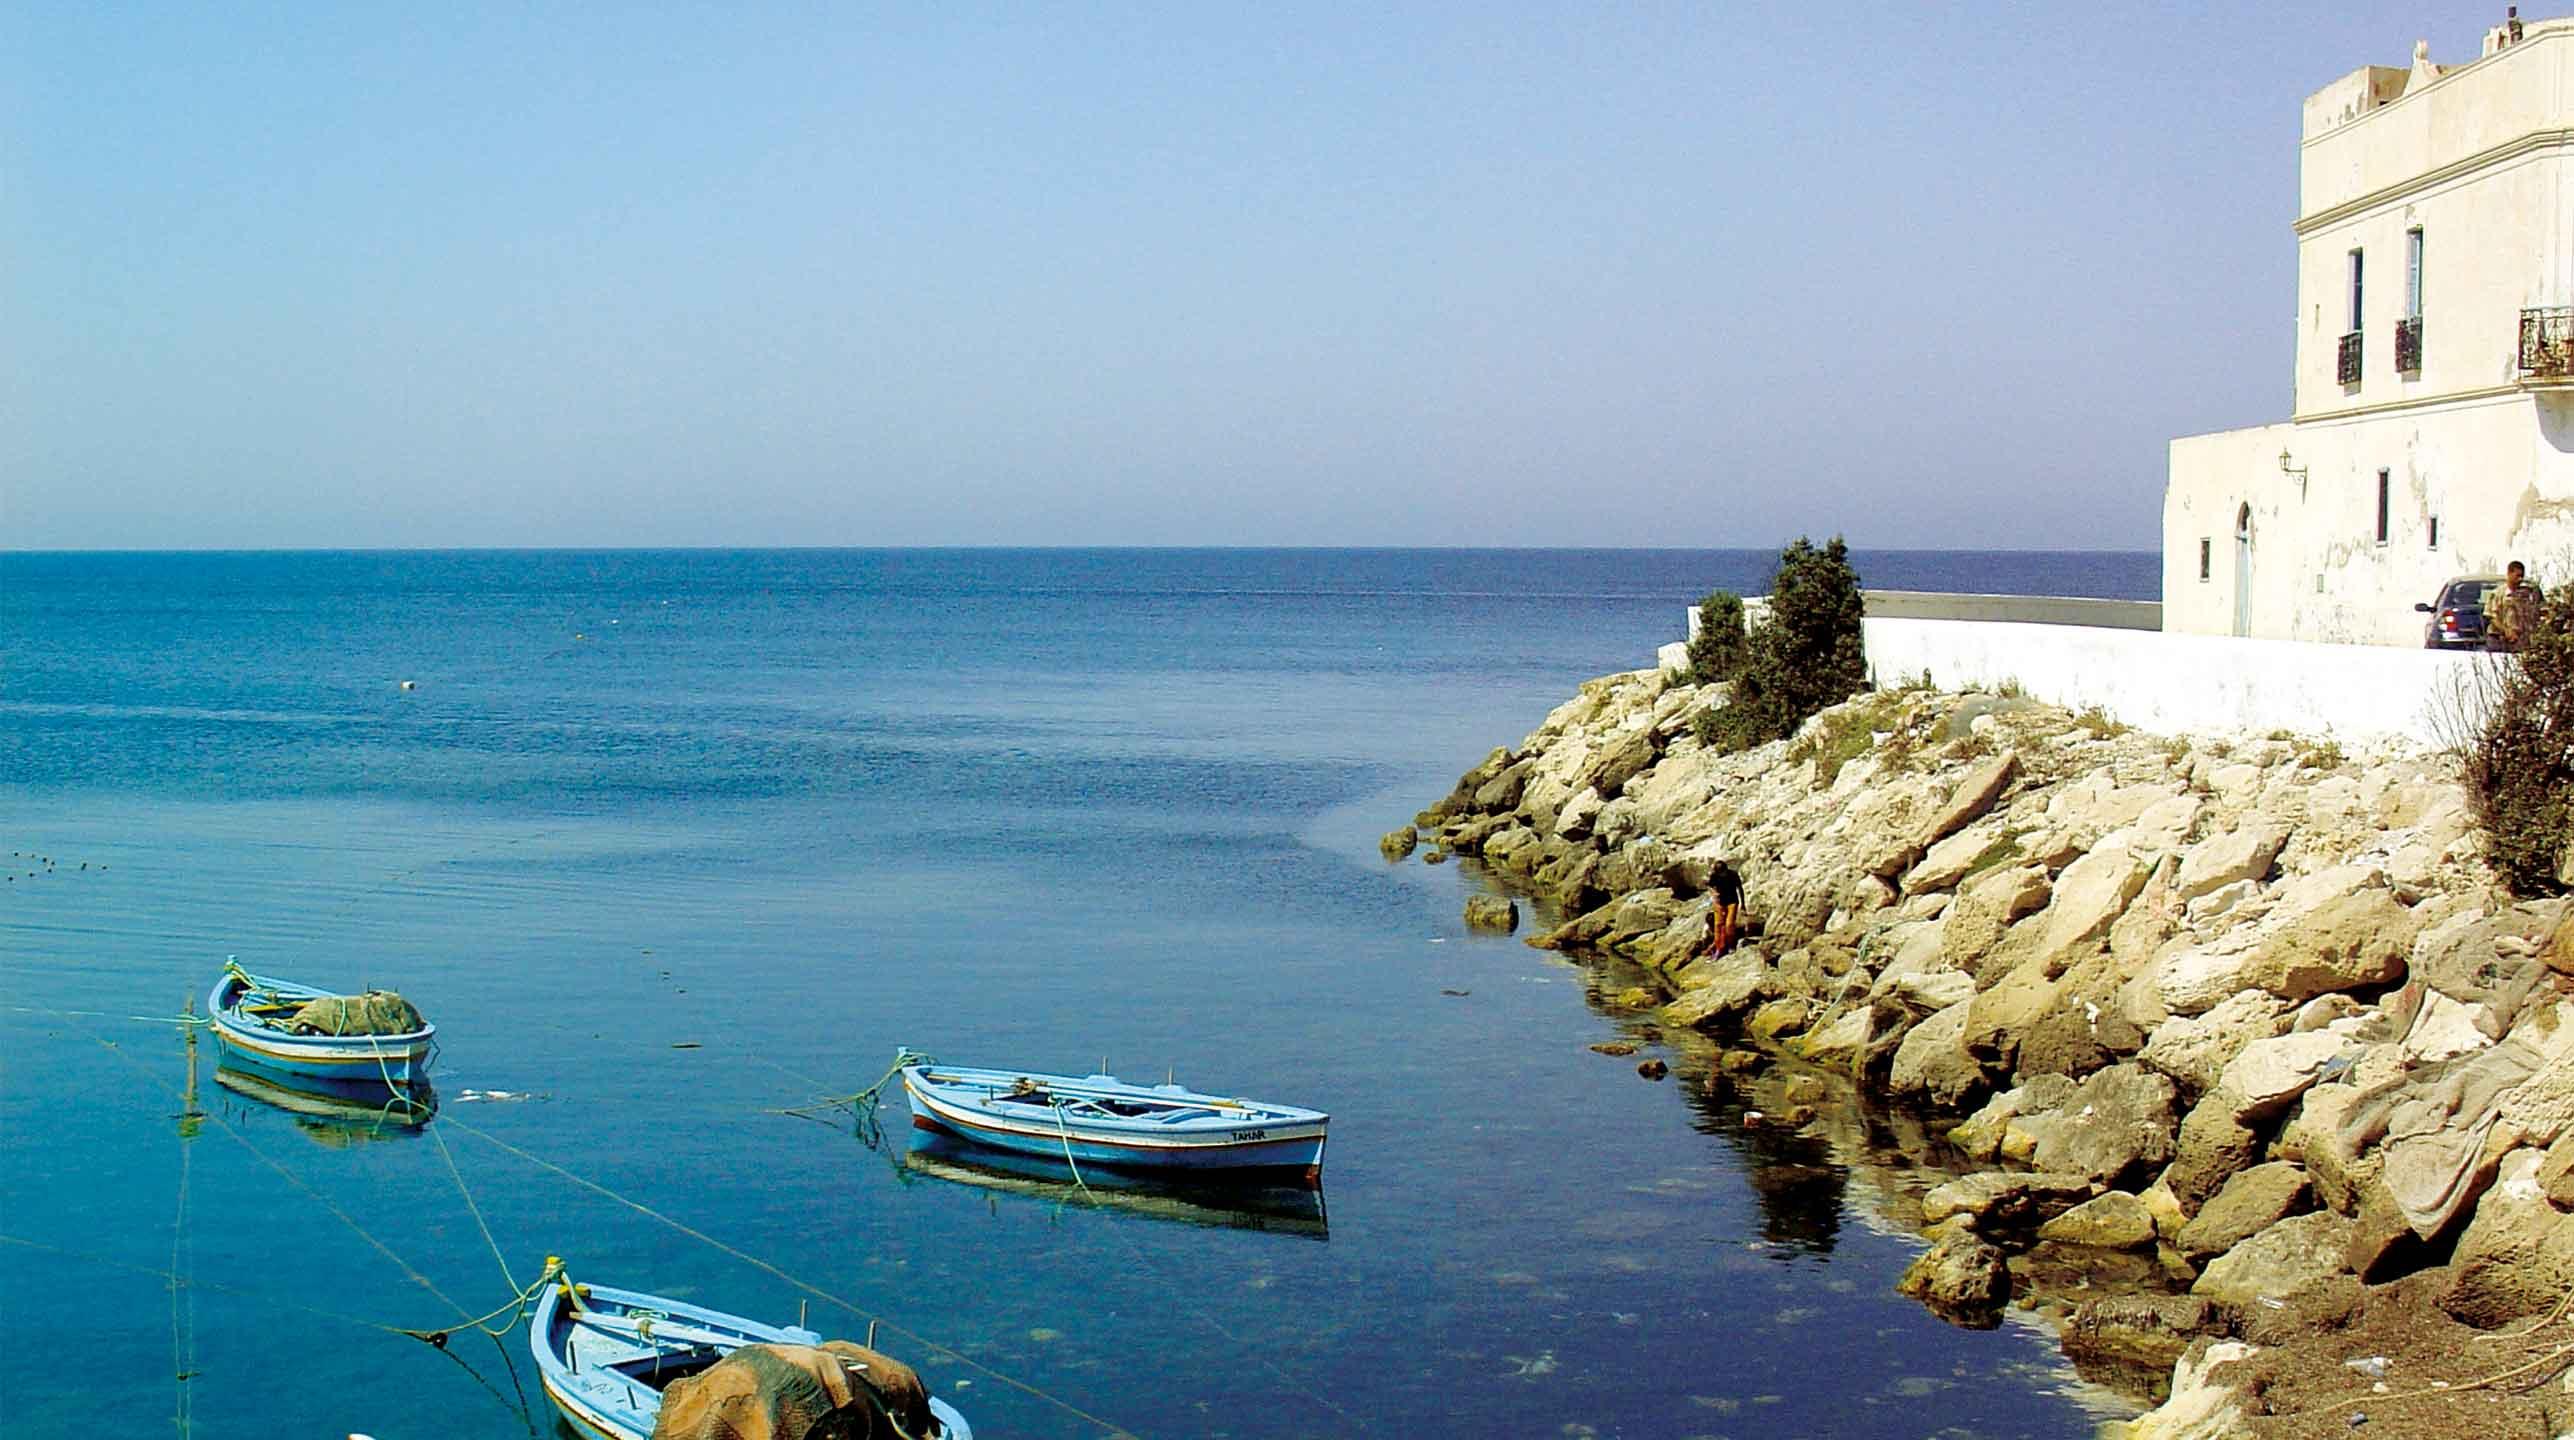 Tunezja – Jedwab, sardynki i morscy piraci